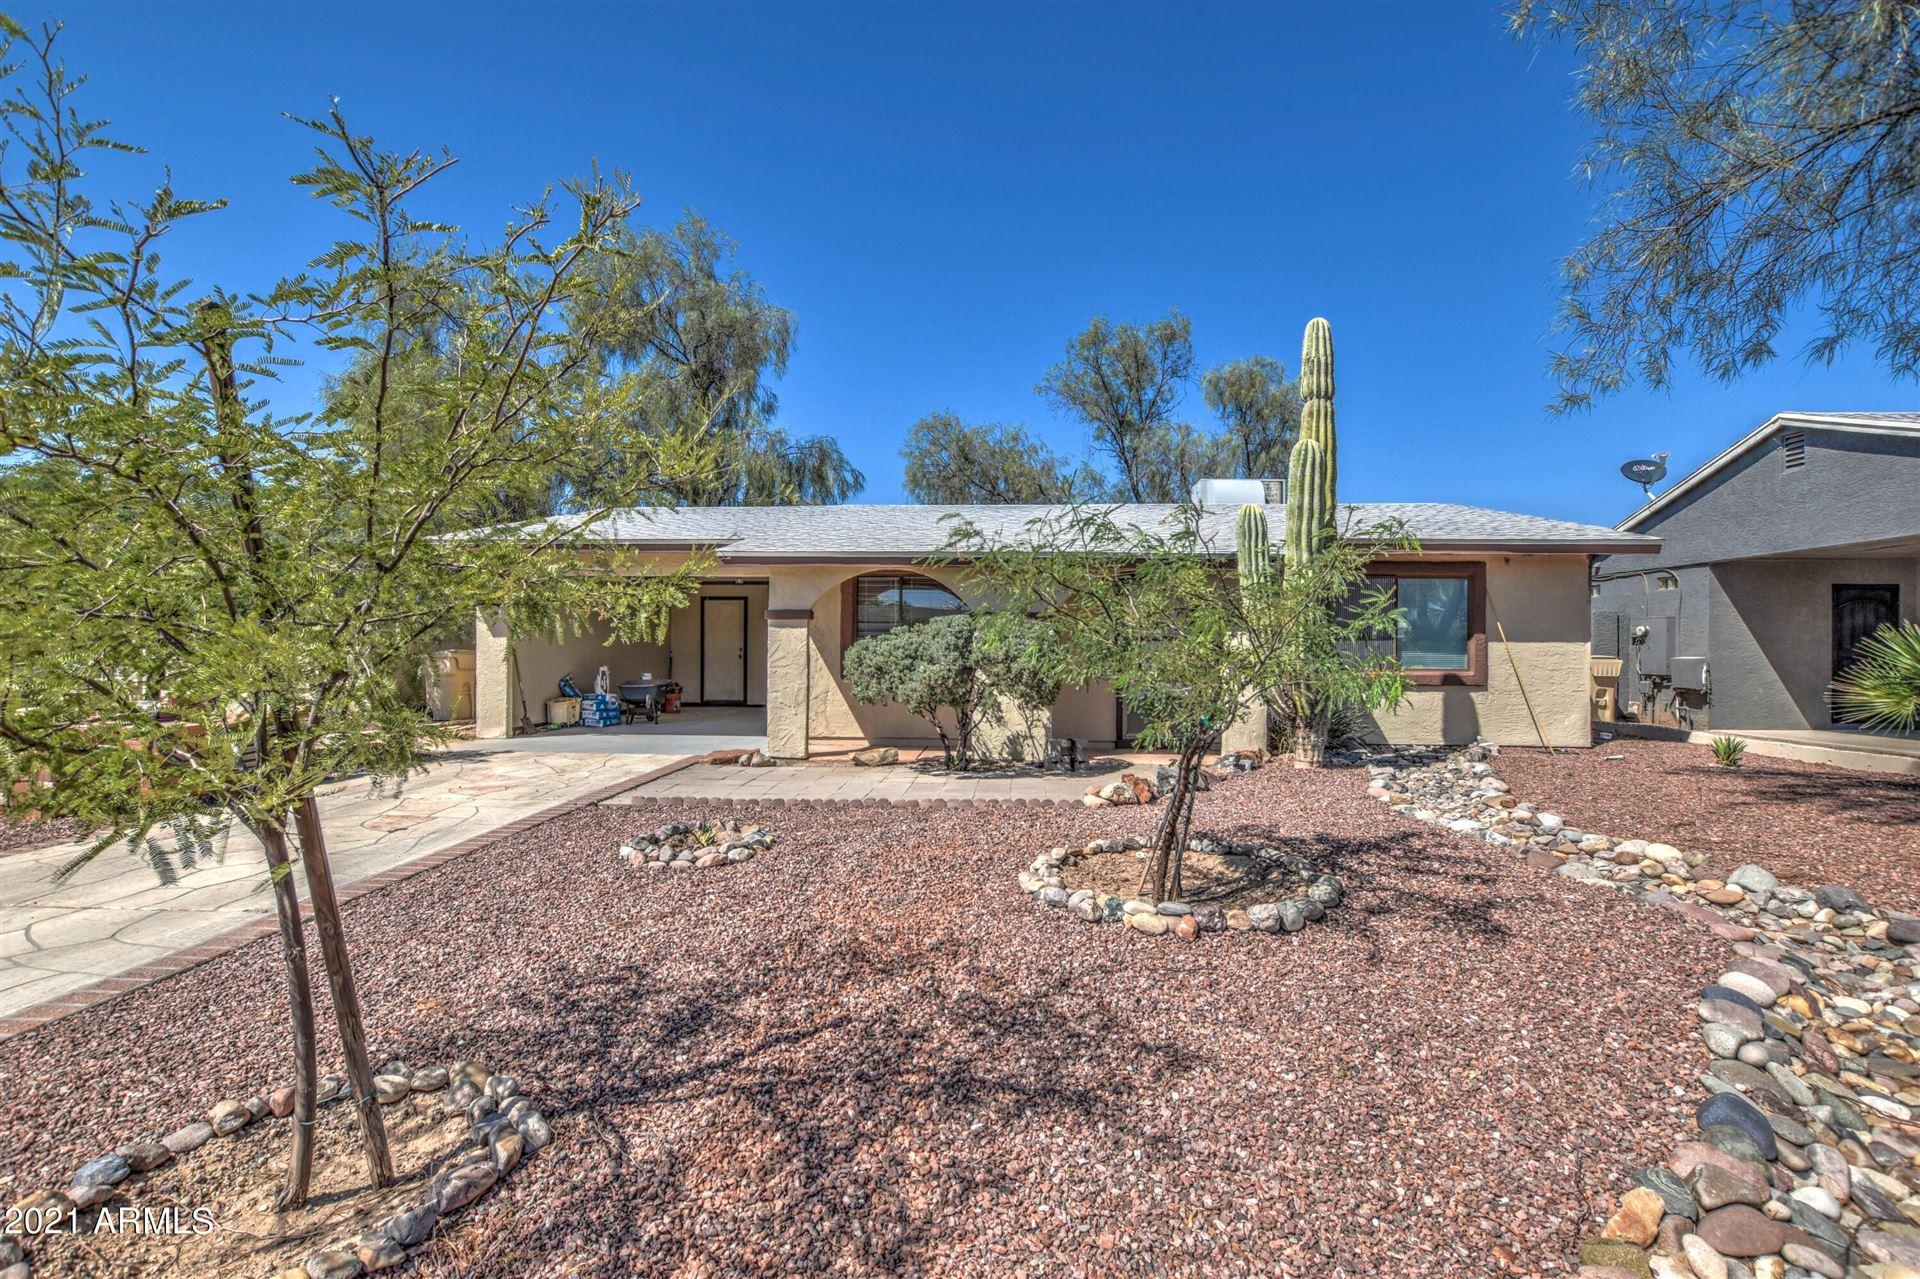 9054 W PINEVETA Drive, Arizona City, AZ 85123 - MLS#: 6286367